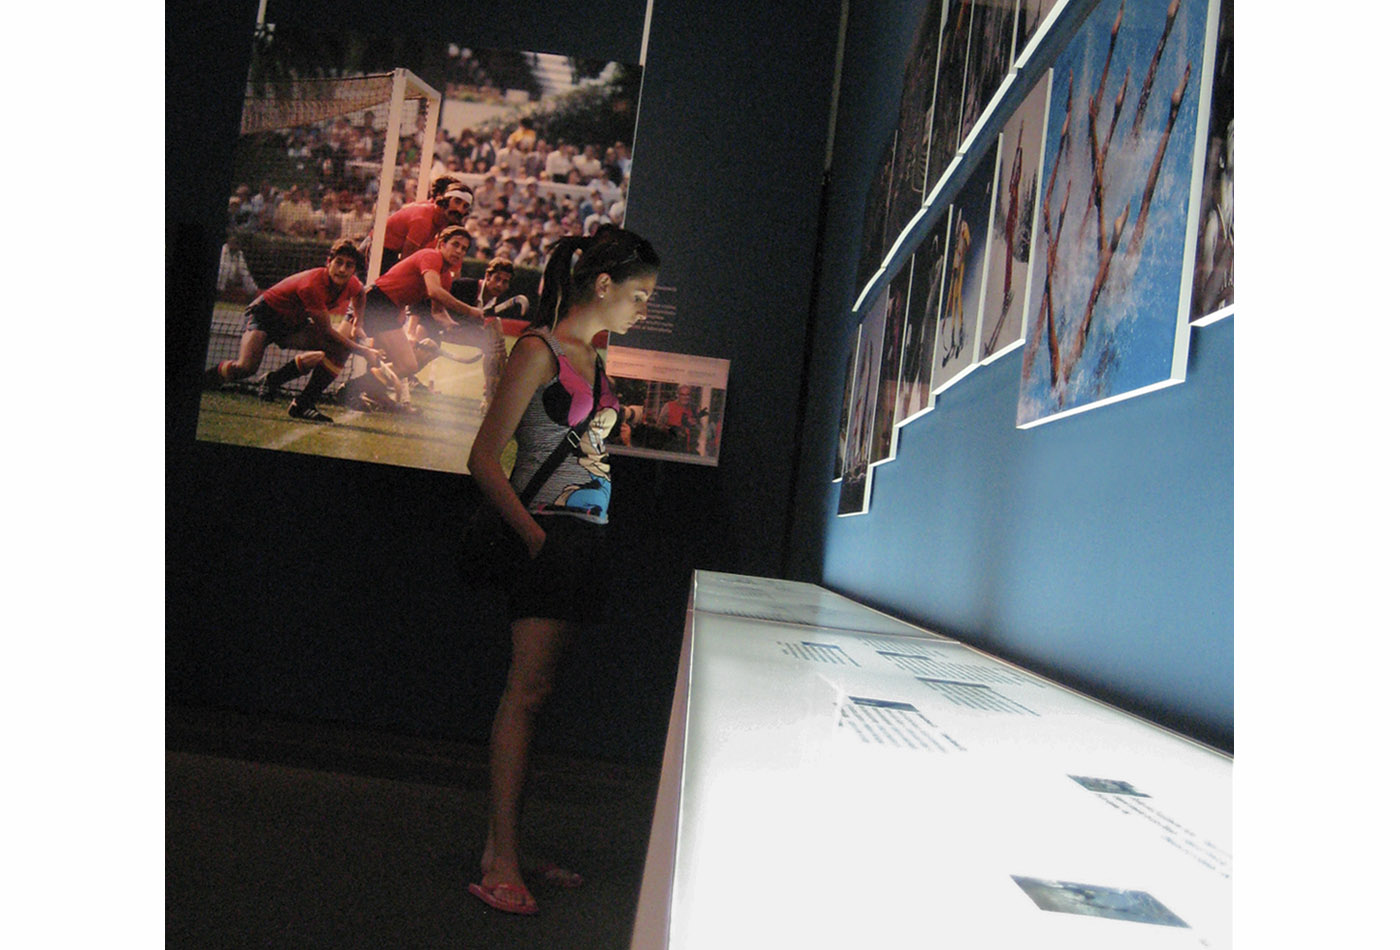 fotograf-avelino-pi-sports-exposicio-deporte-creartiva-disseny-caixaforum